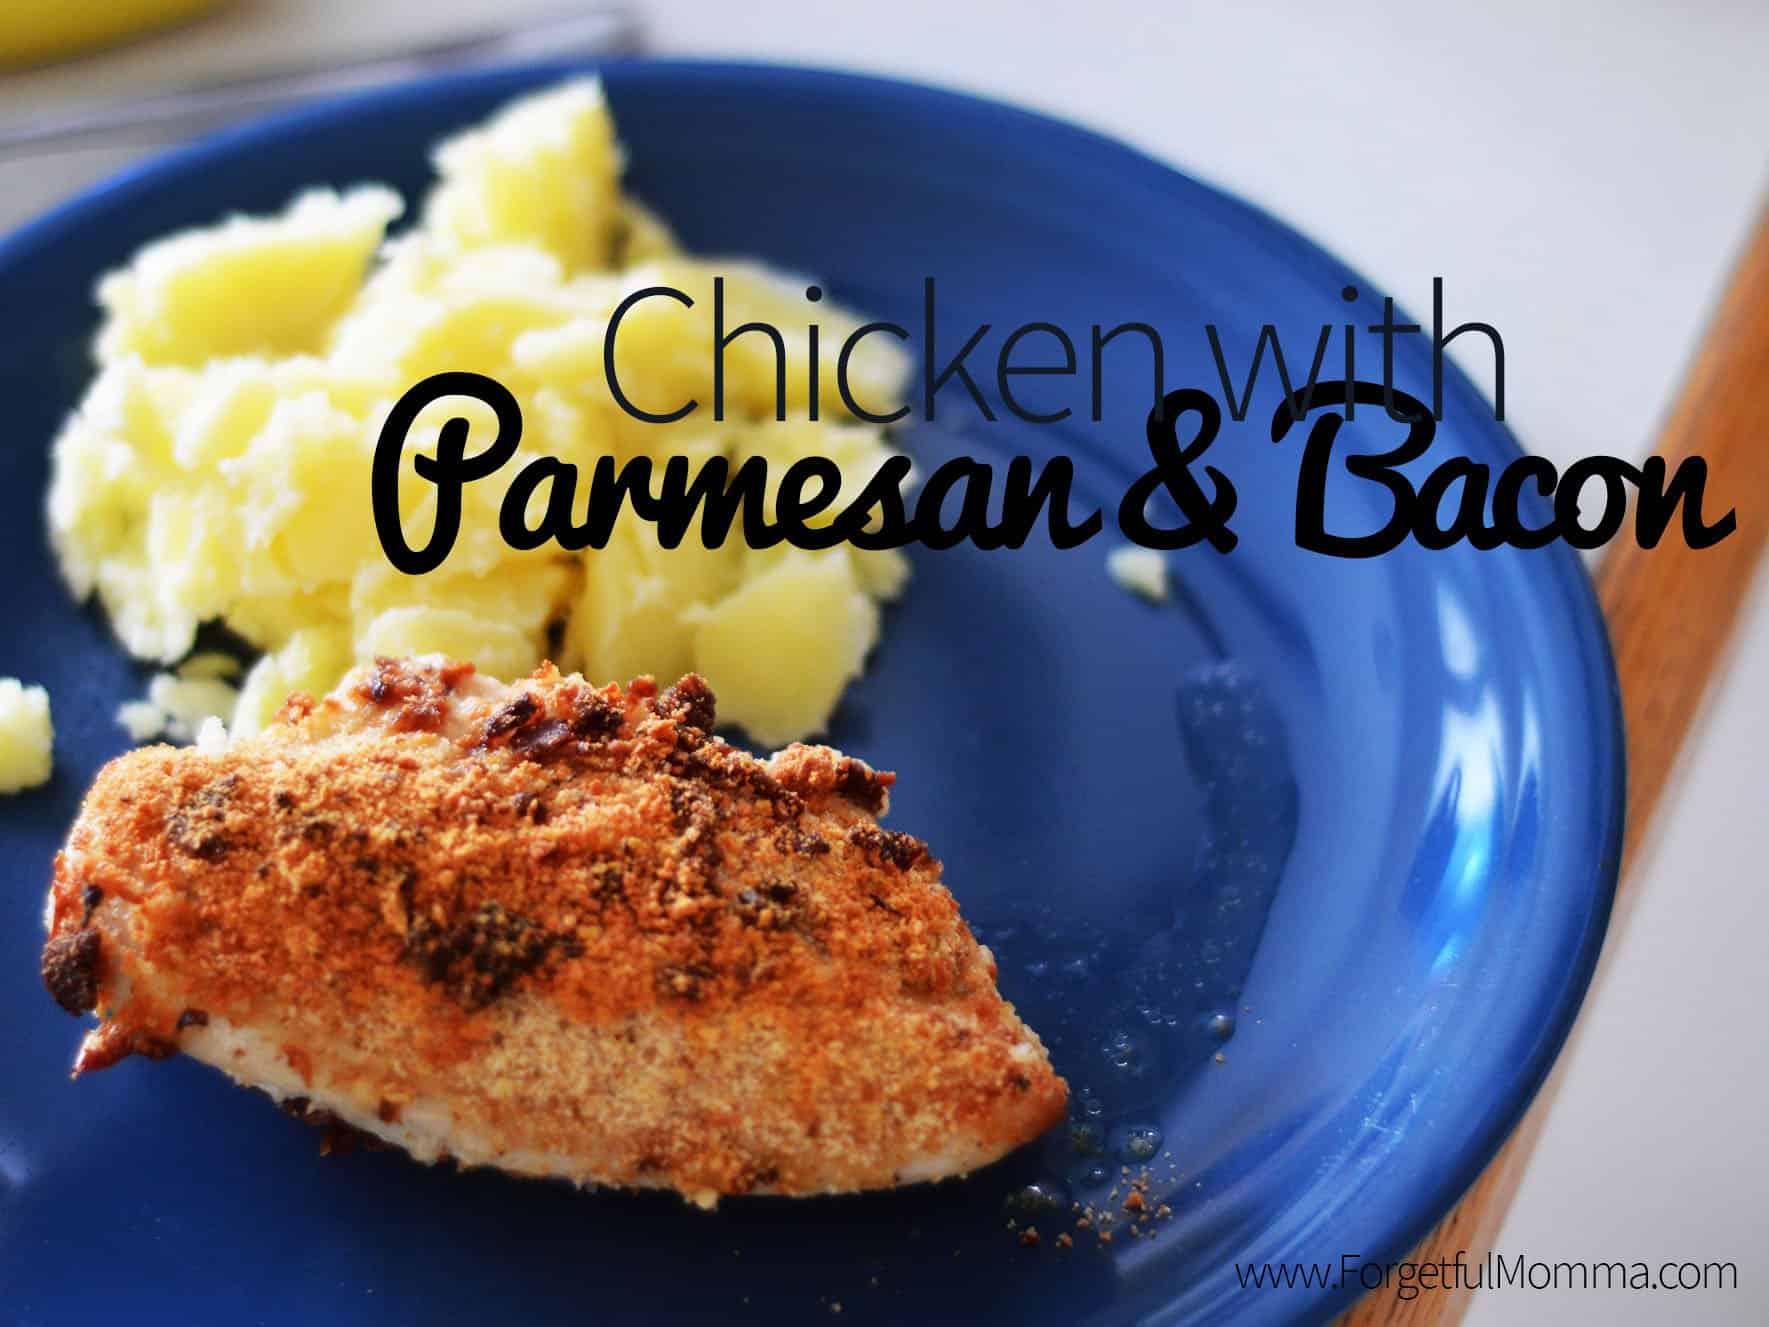 Chicken Parmesan & Bacon